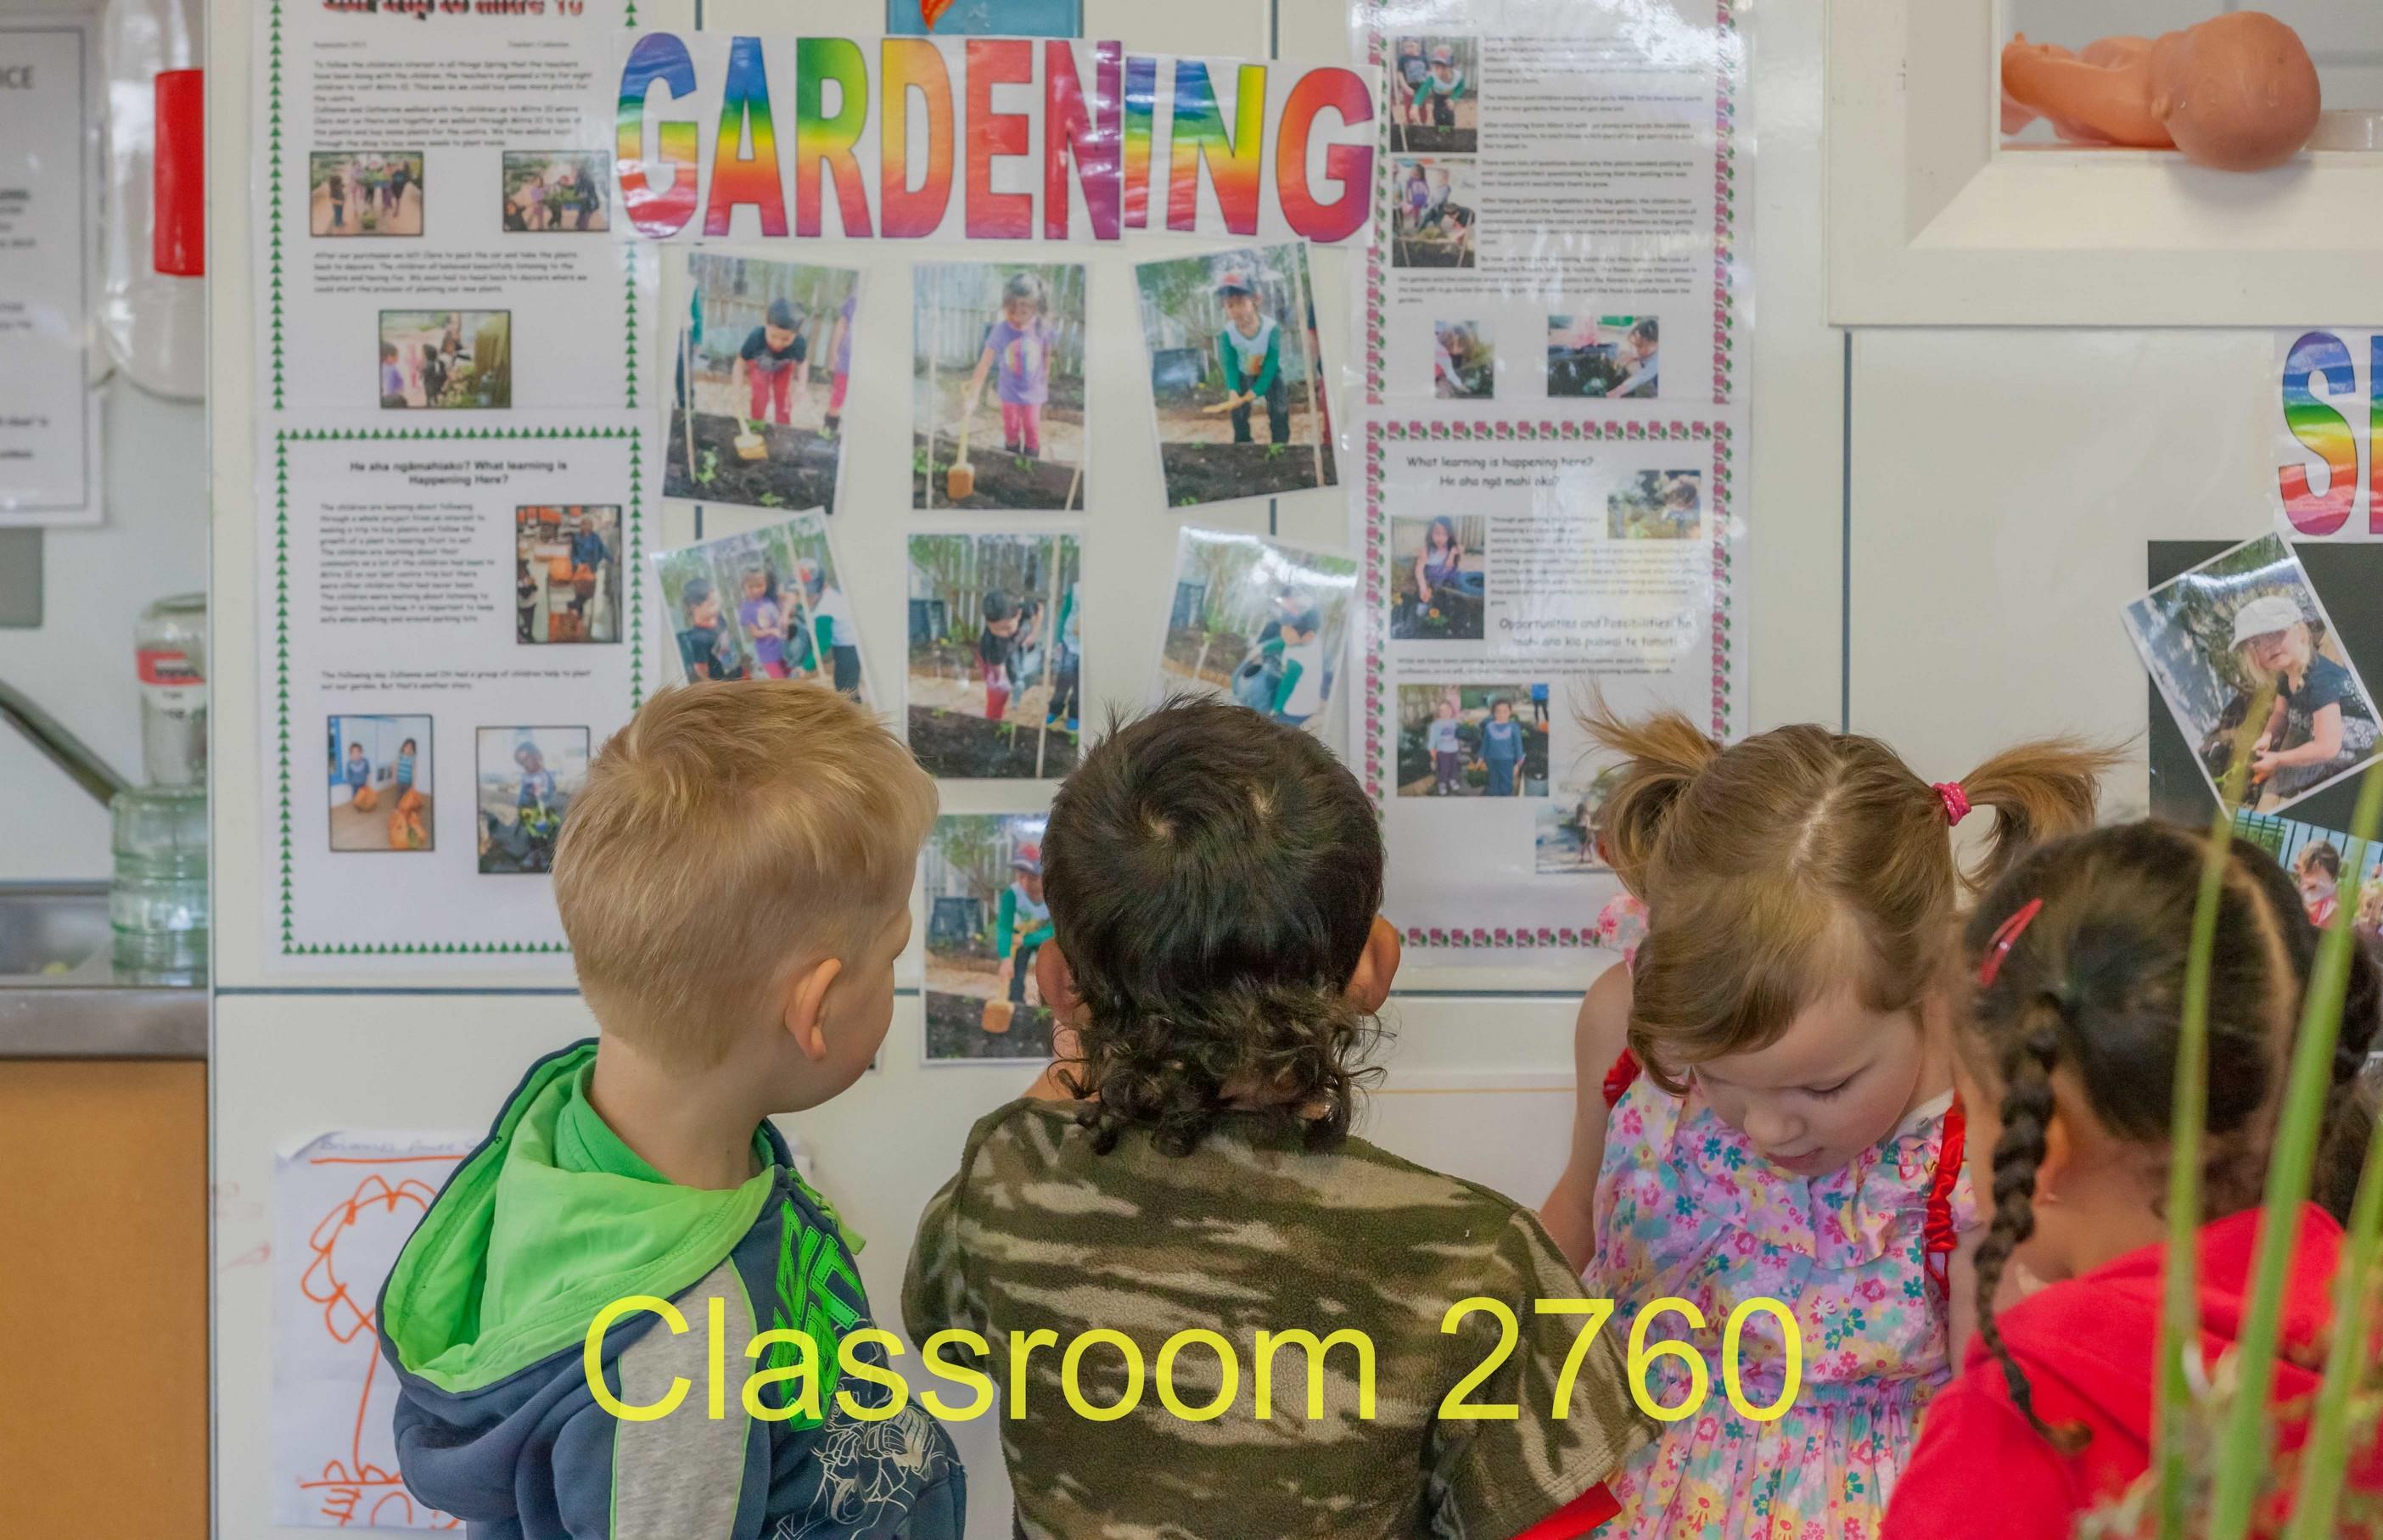 Classroom 2760